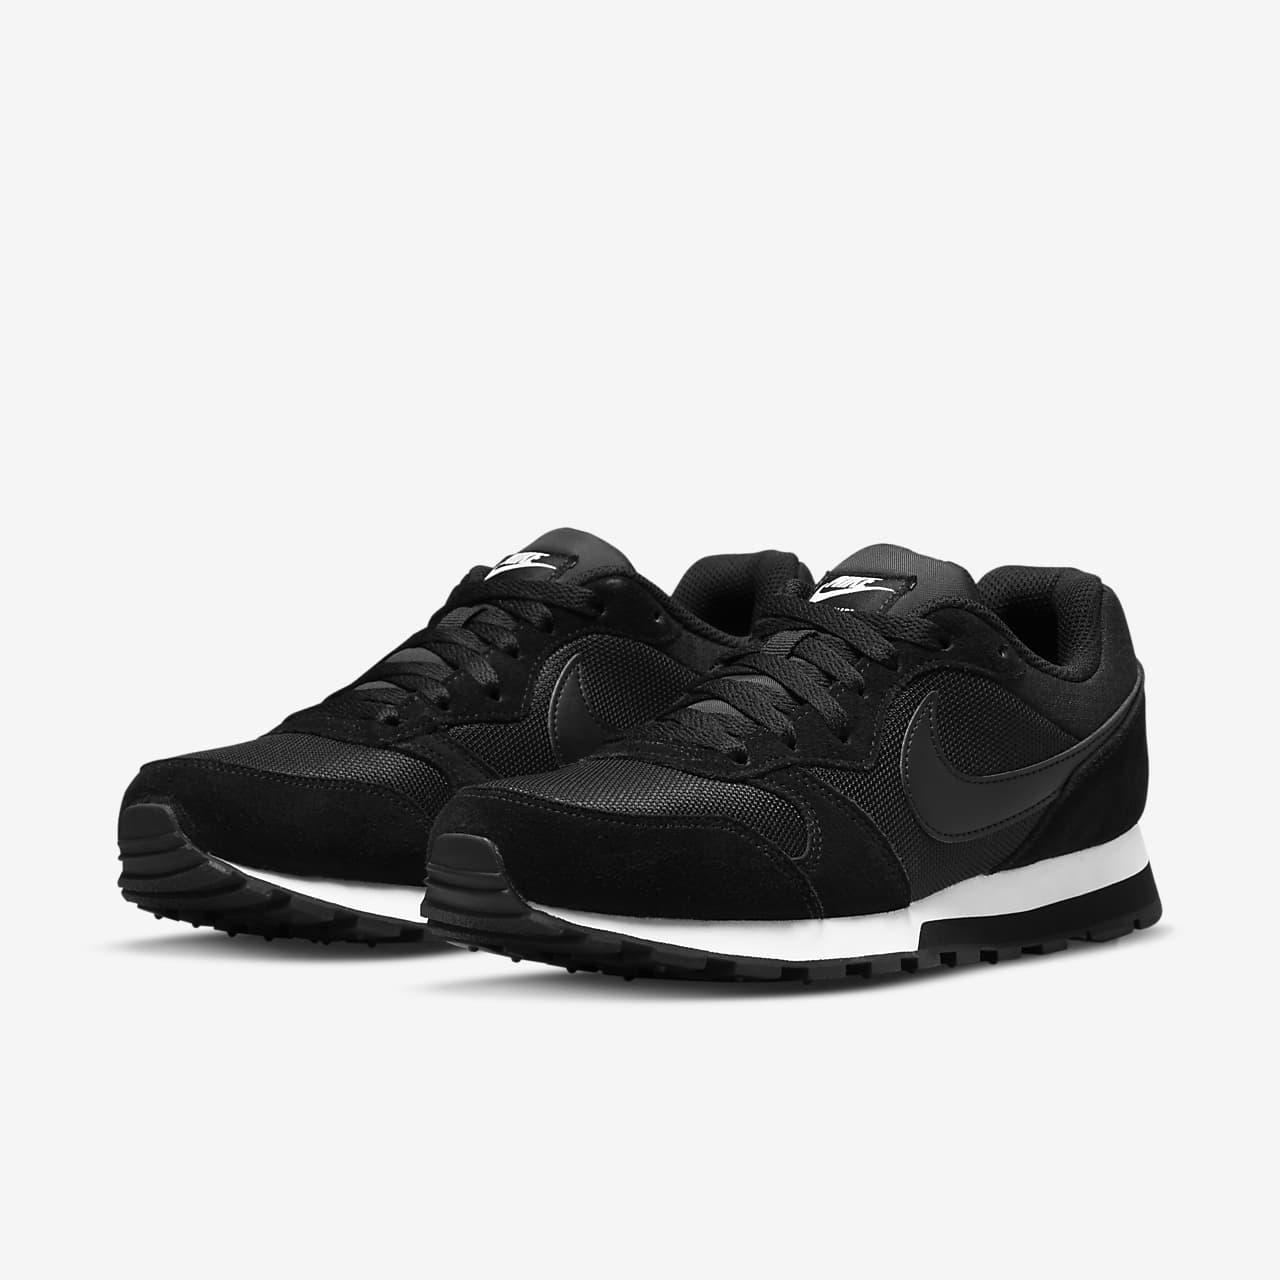 sale retailer e8168 14224 chaussures md runner noir nike